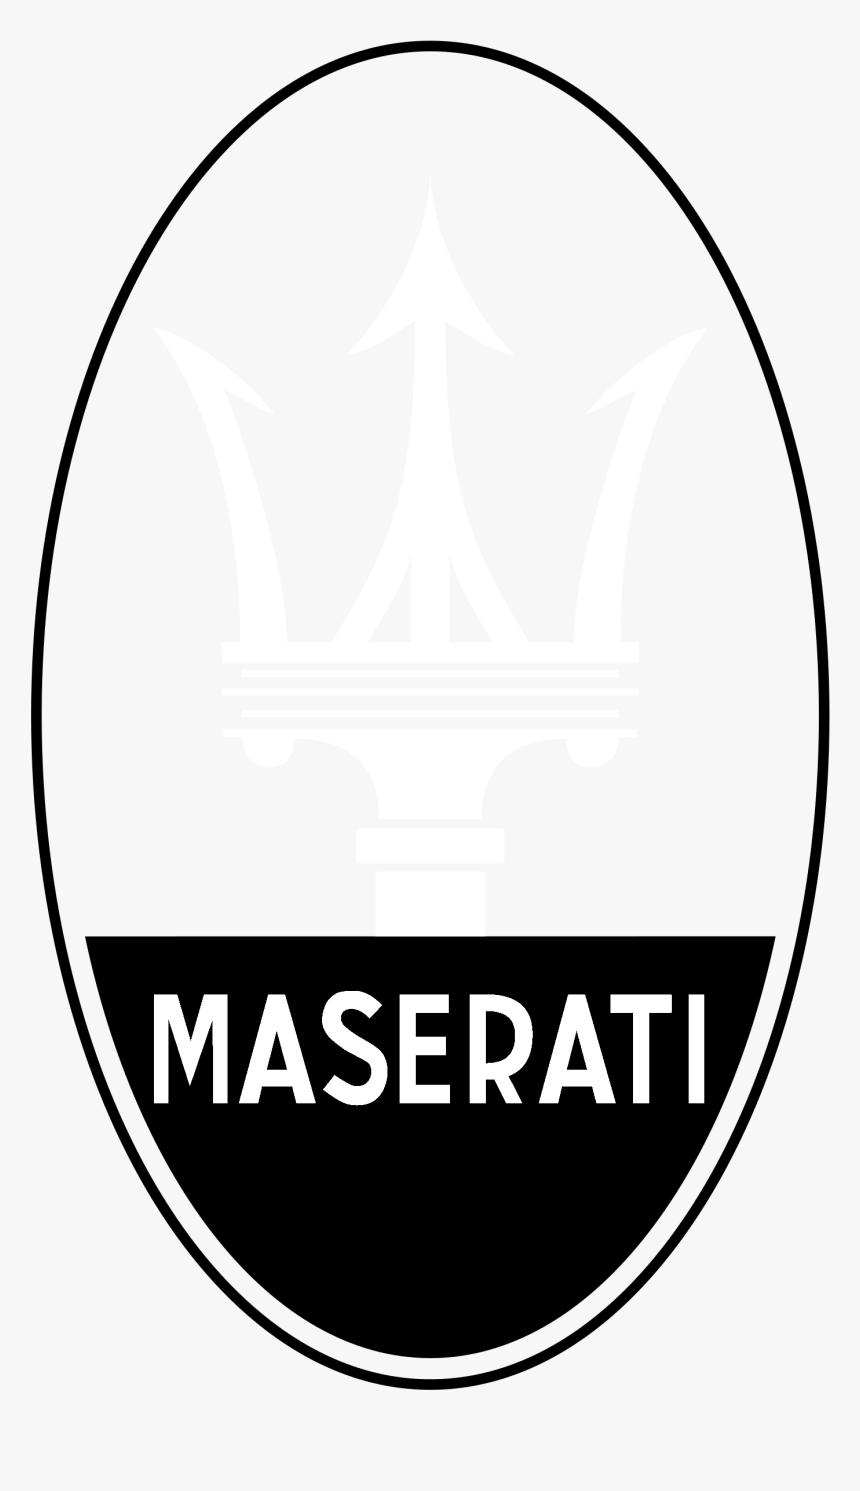 Maserati Logo Black And White - Maserati Emblem, HD Png Download, Free Download